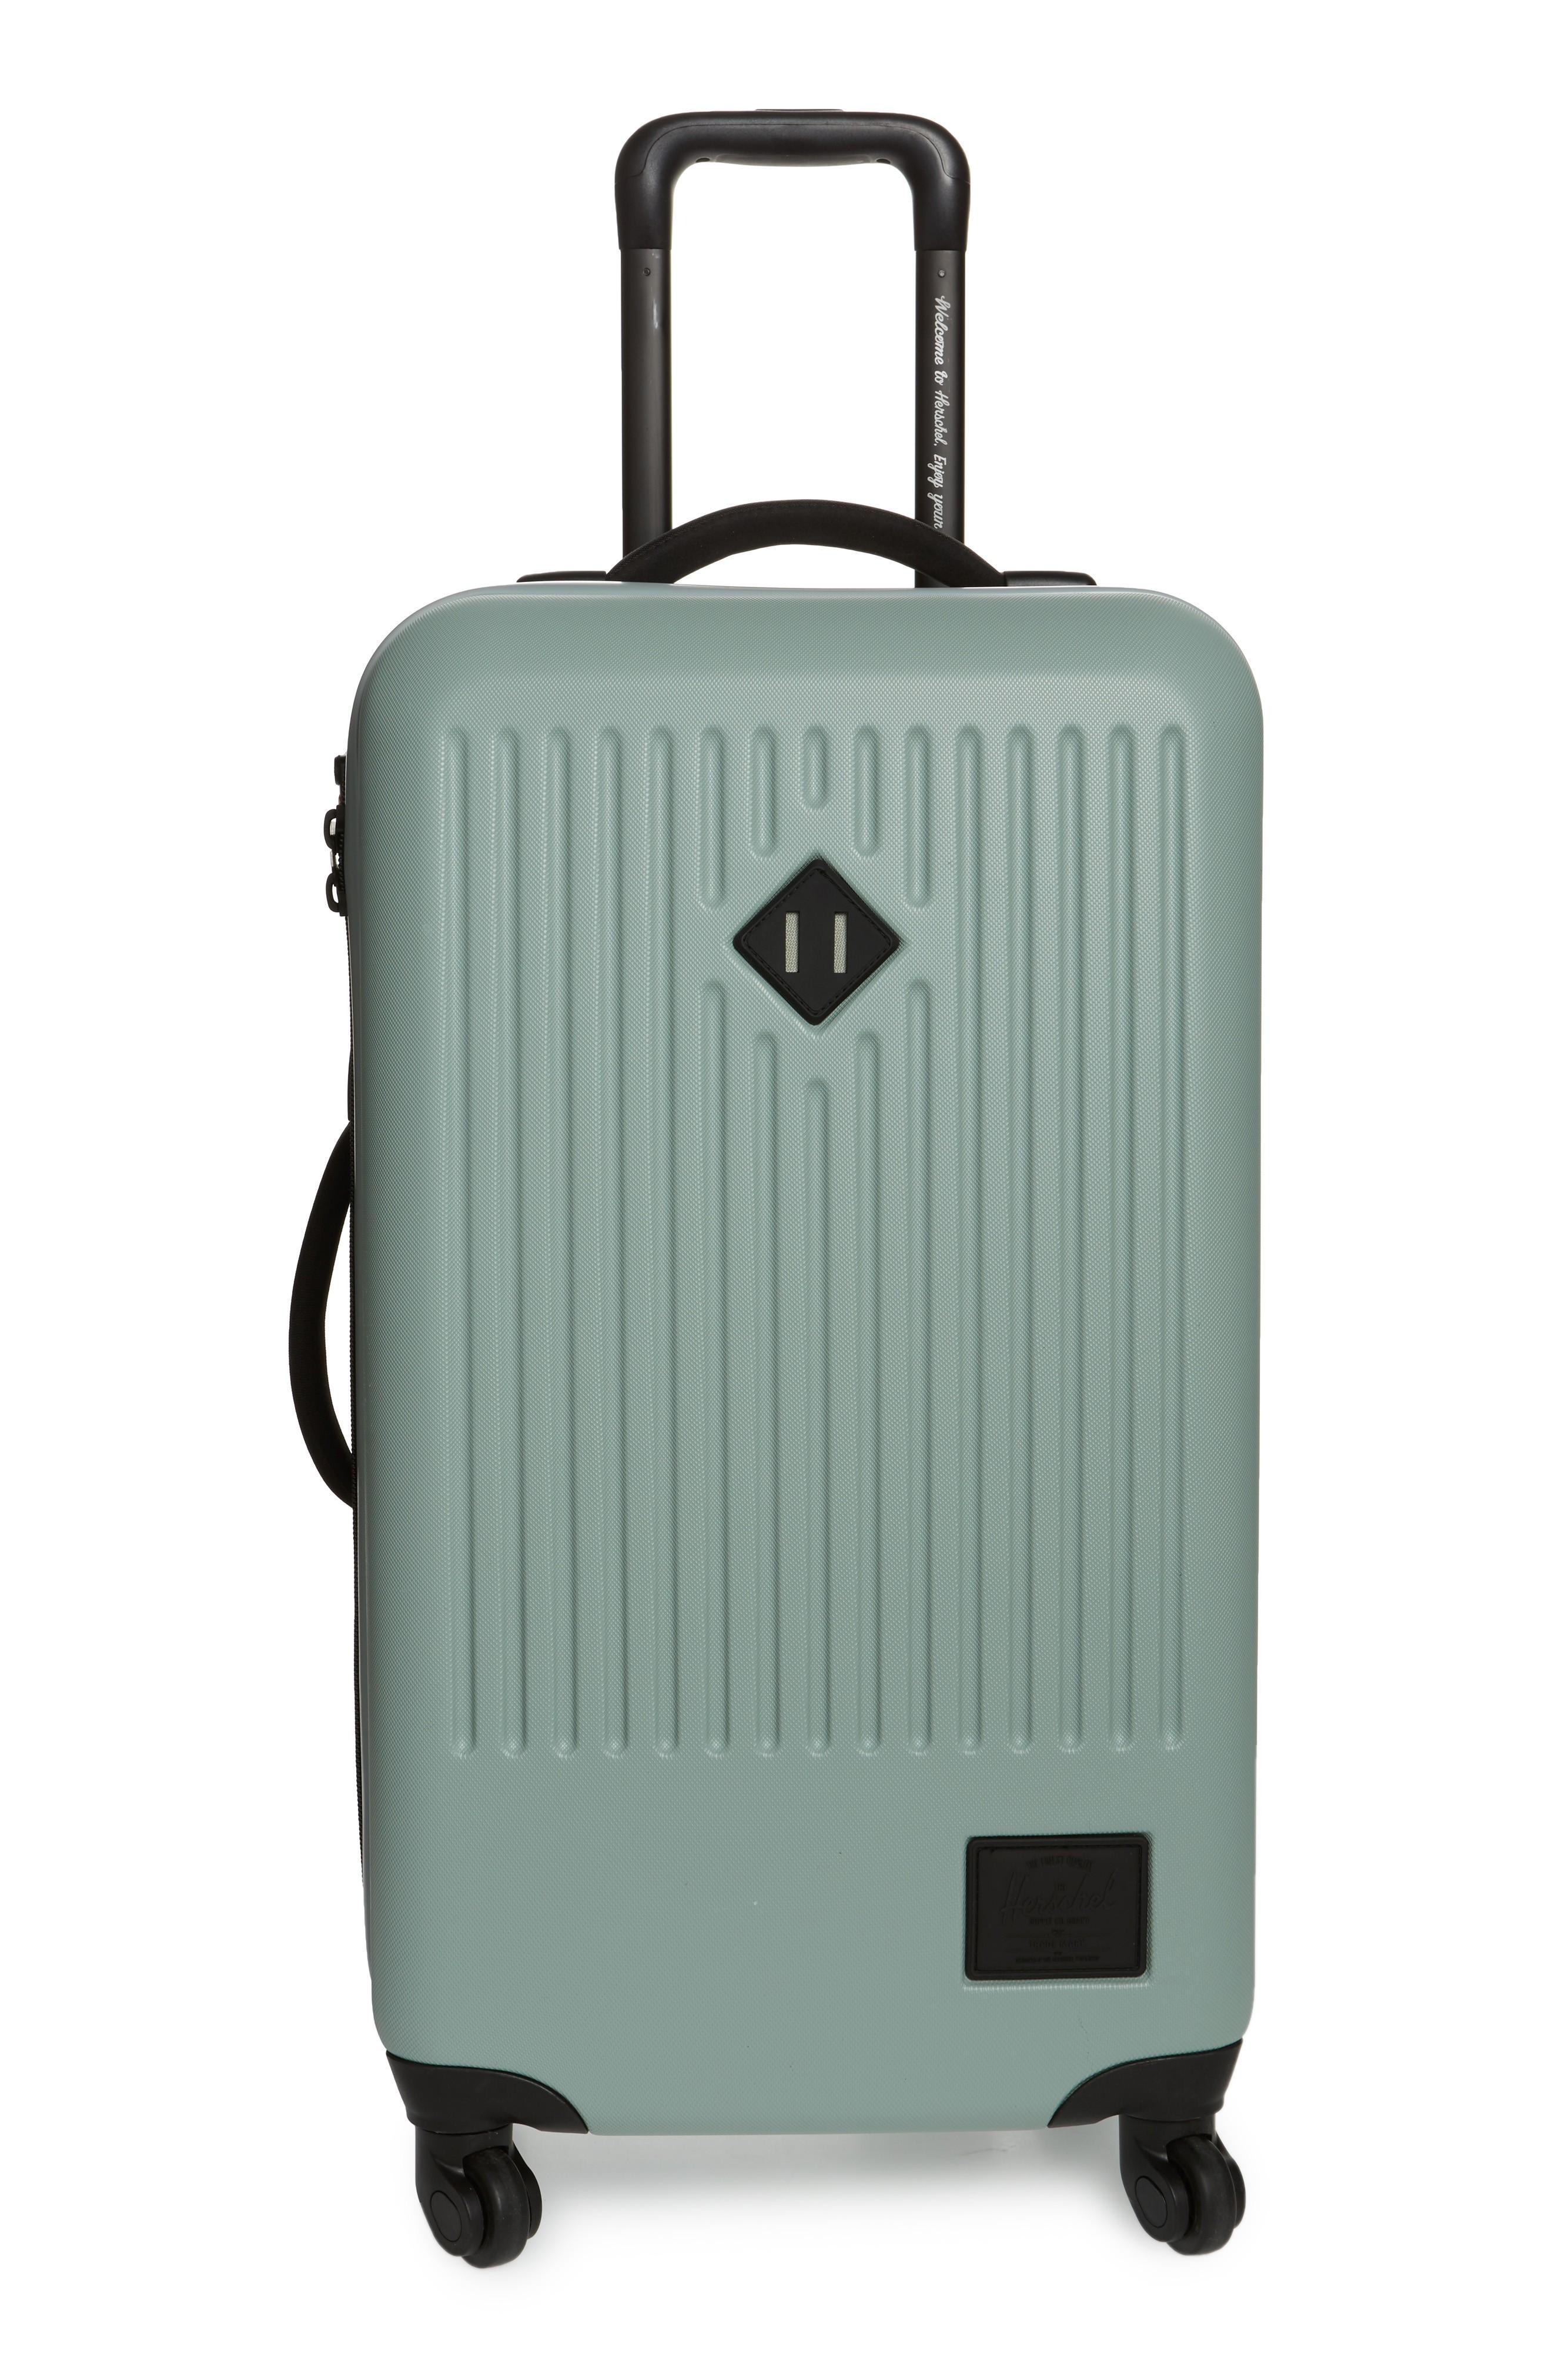 c4a4dd415 Herschel Supply Co. Medium Trade Wheeled Packing Case - Green In Iceberg  Green